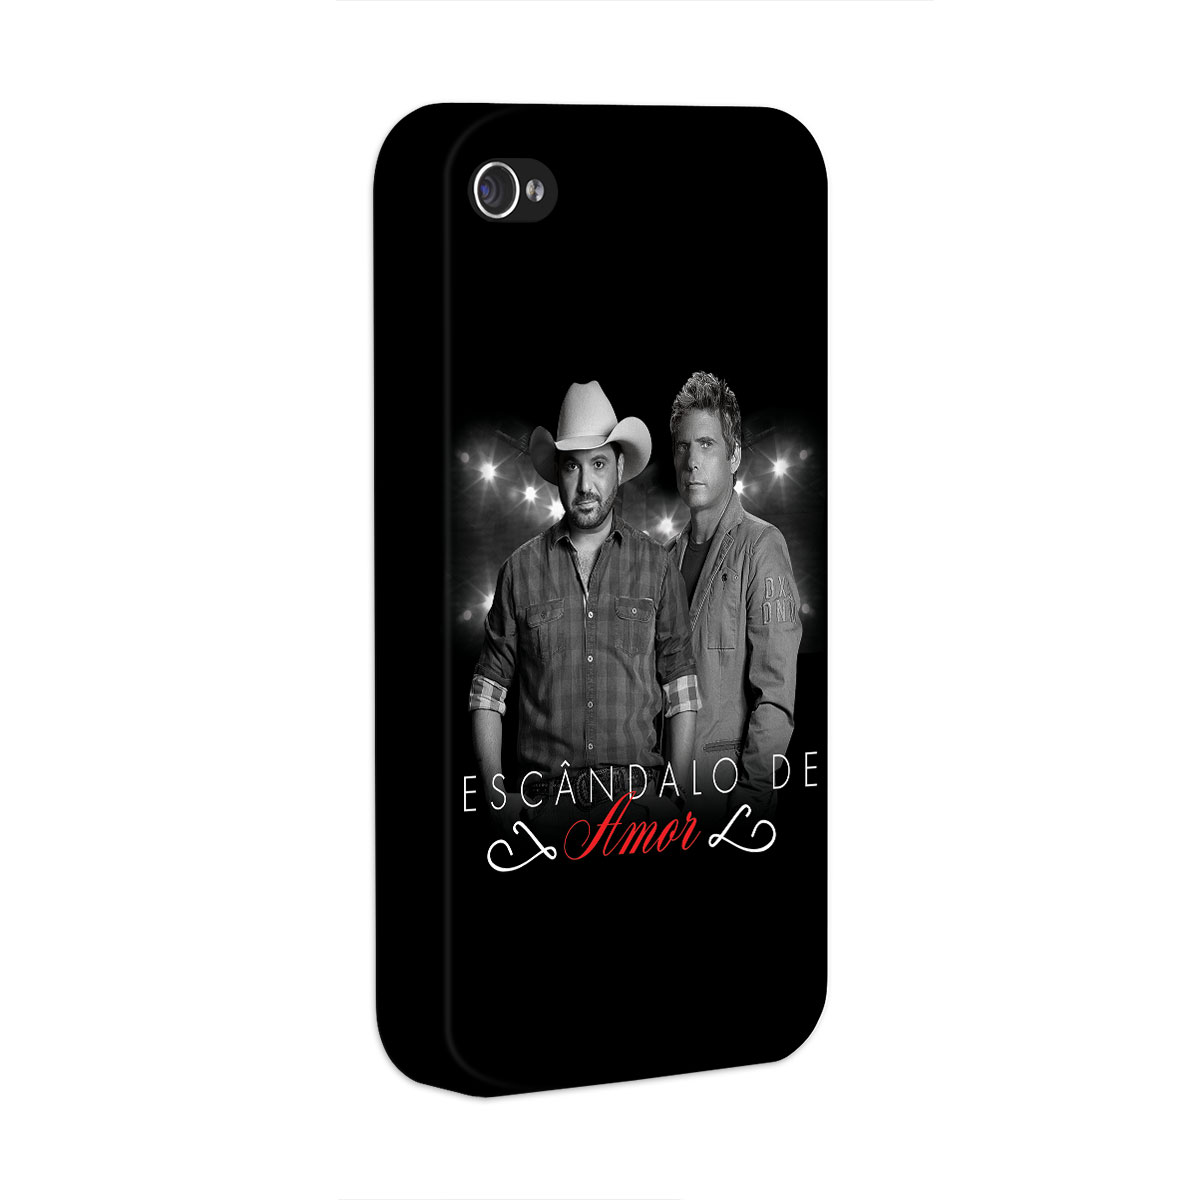 Capa para iPhone 4/4S Edson & Hudson Escândalo de Amor Foto